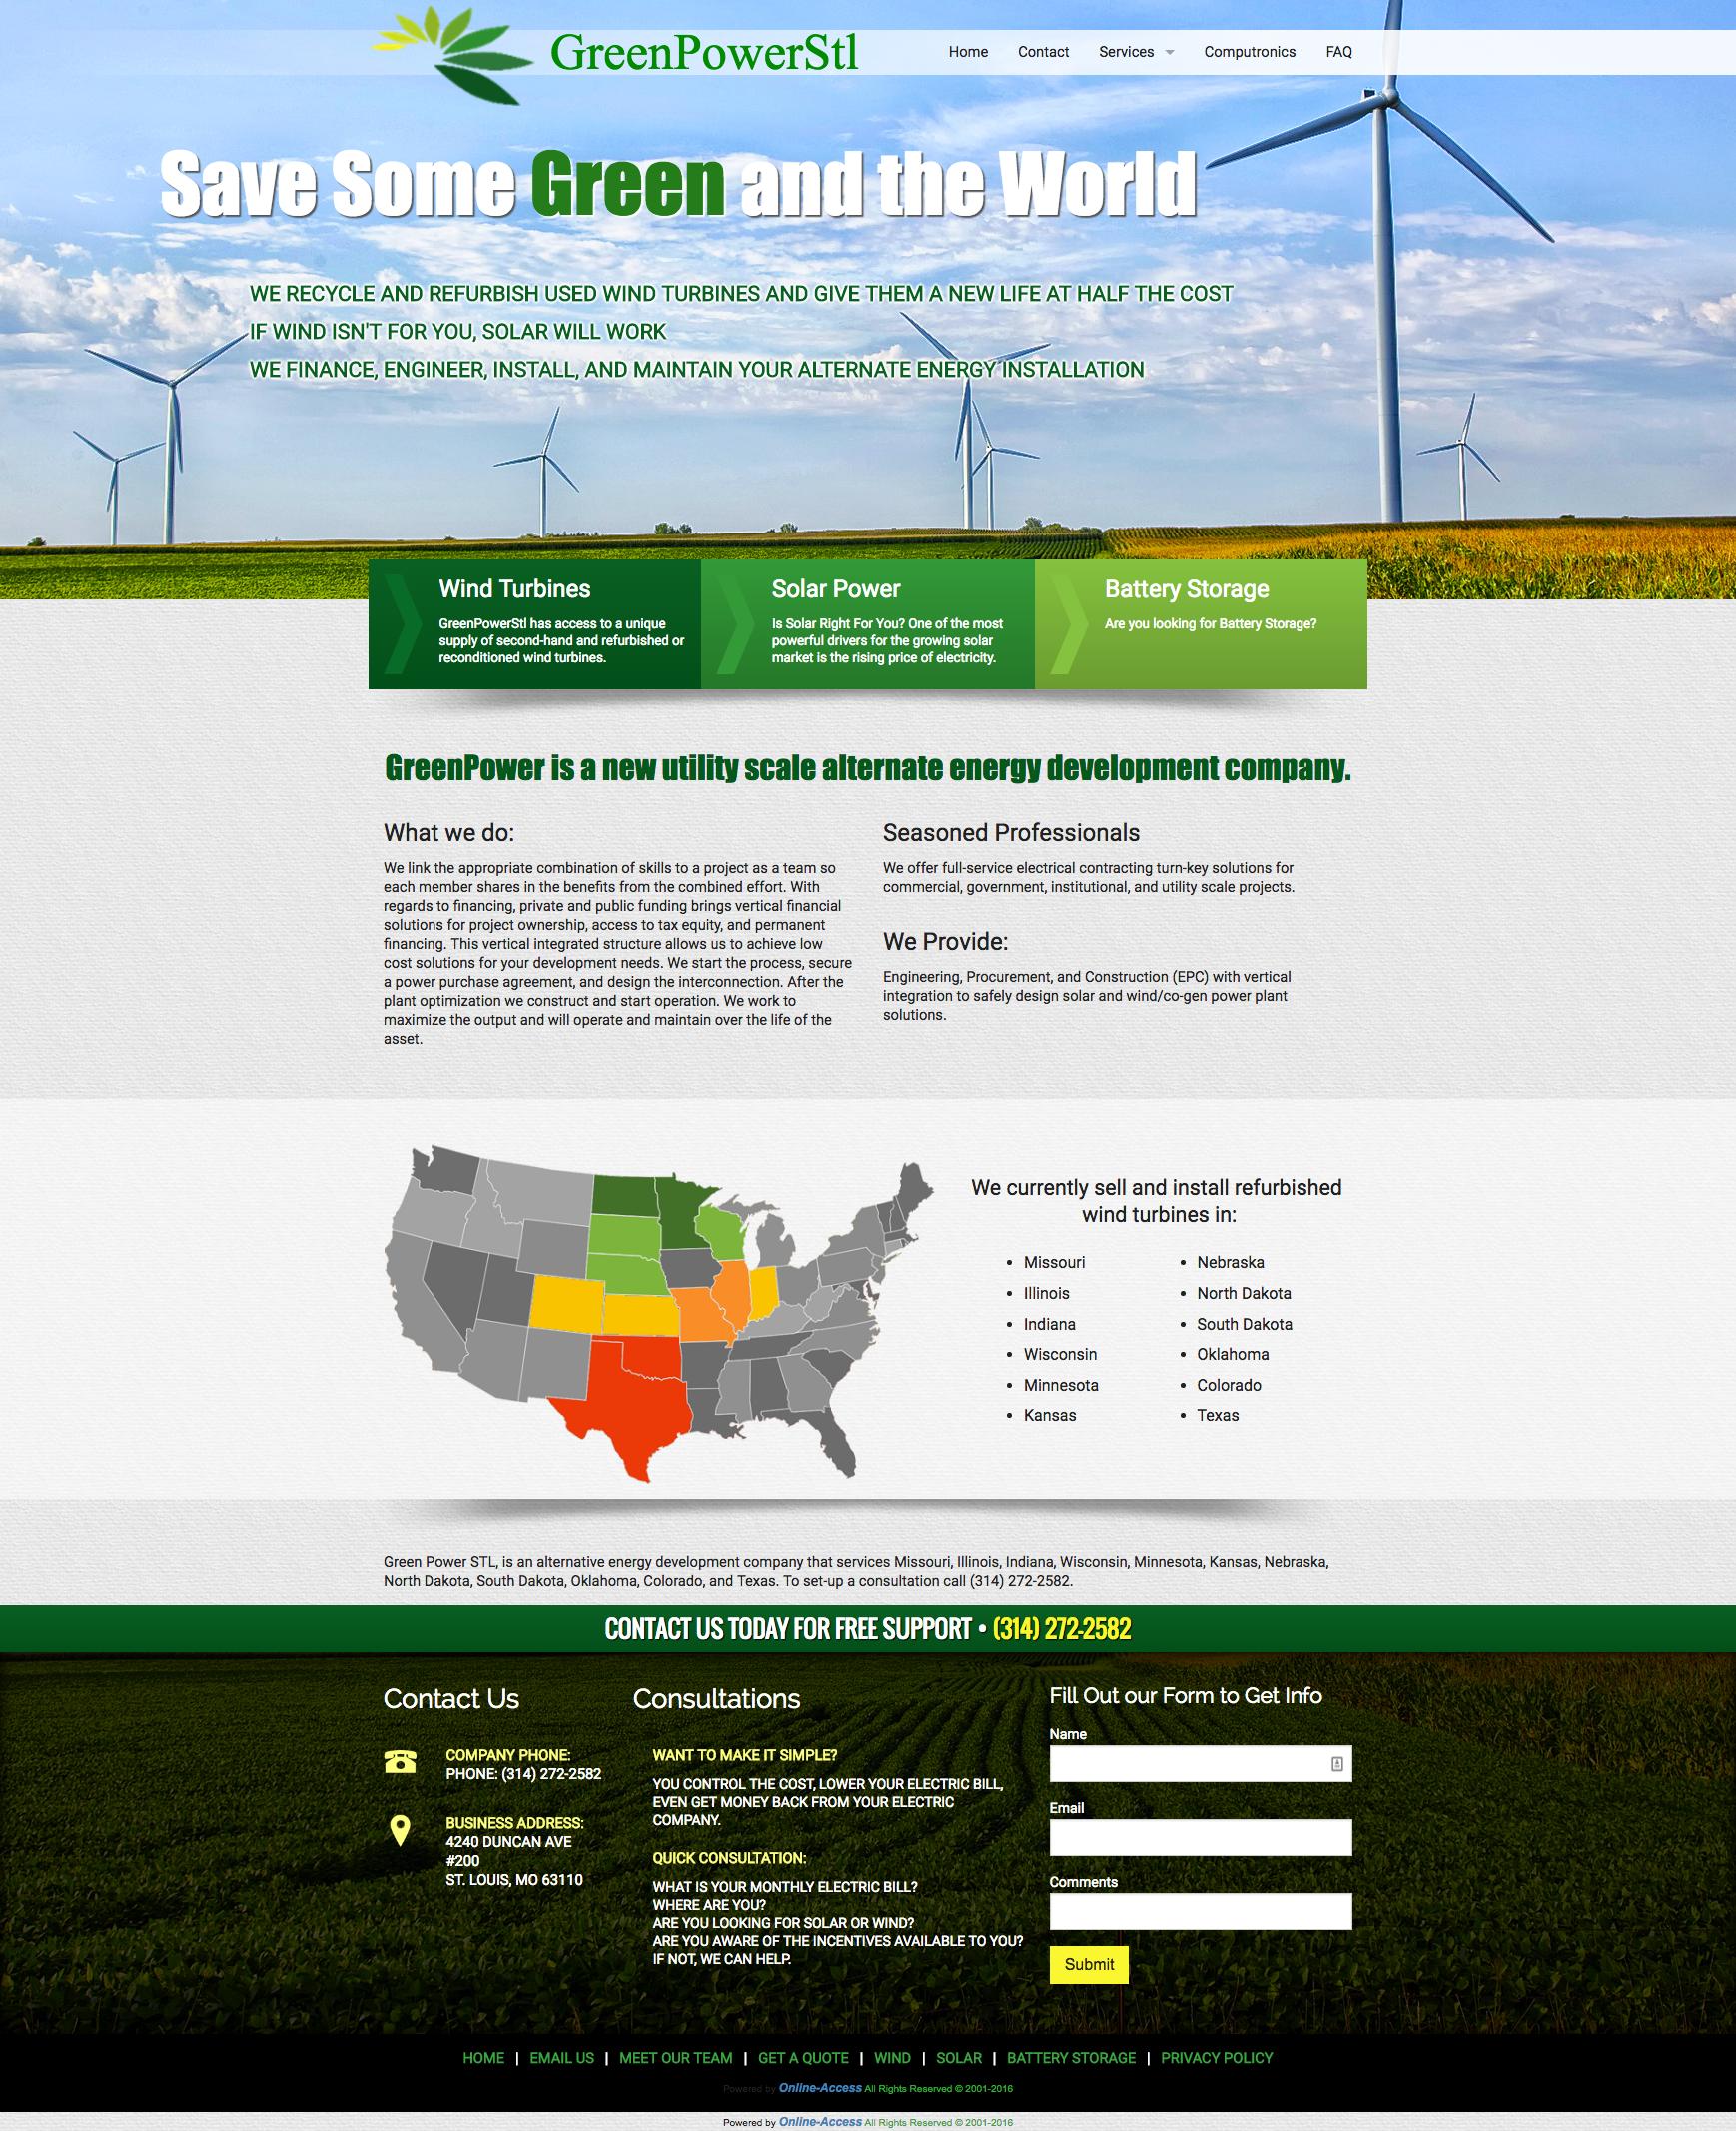 Green Power STL St. Louis, MO Wind Turbine windmill and